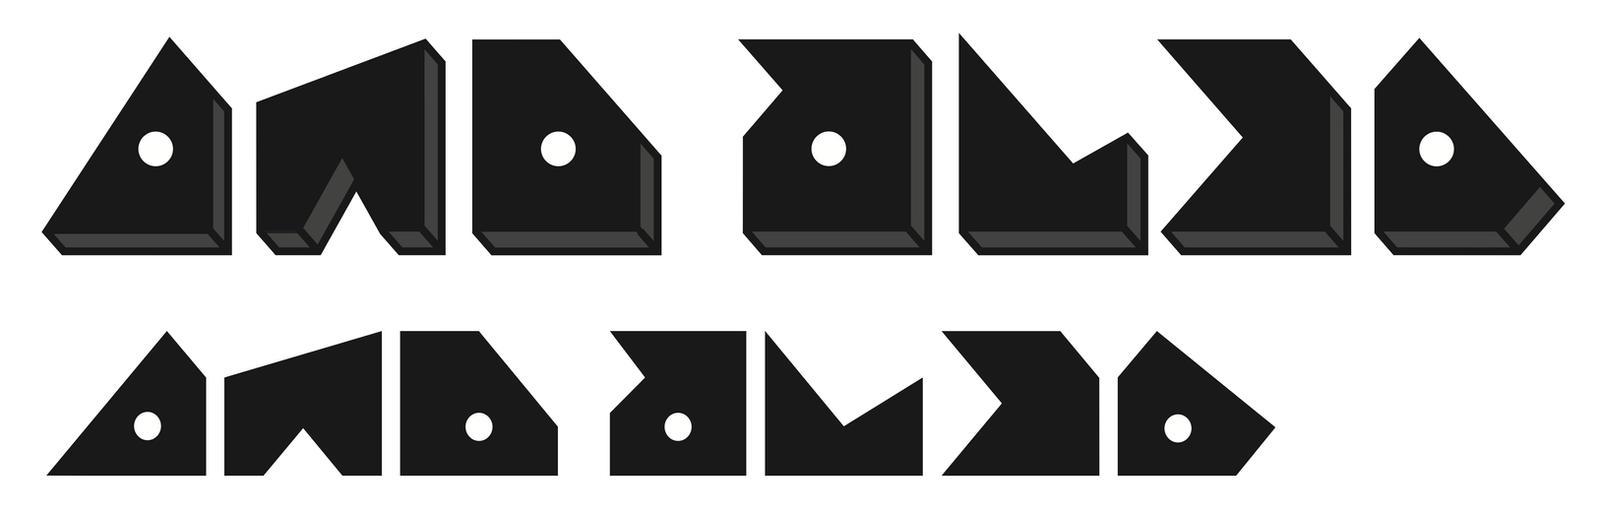 Deseret Alphabet -Redesign by ninjaforlife